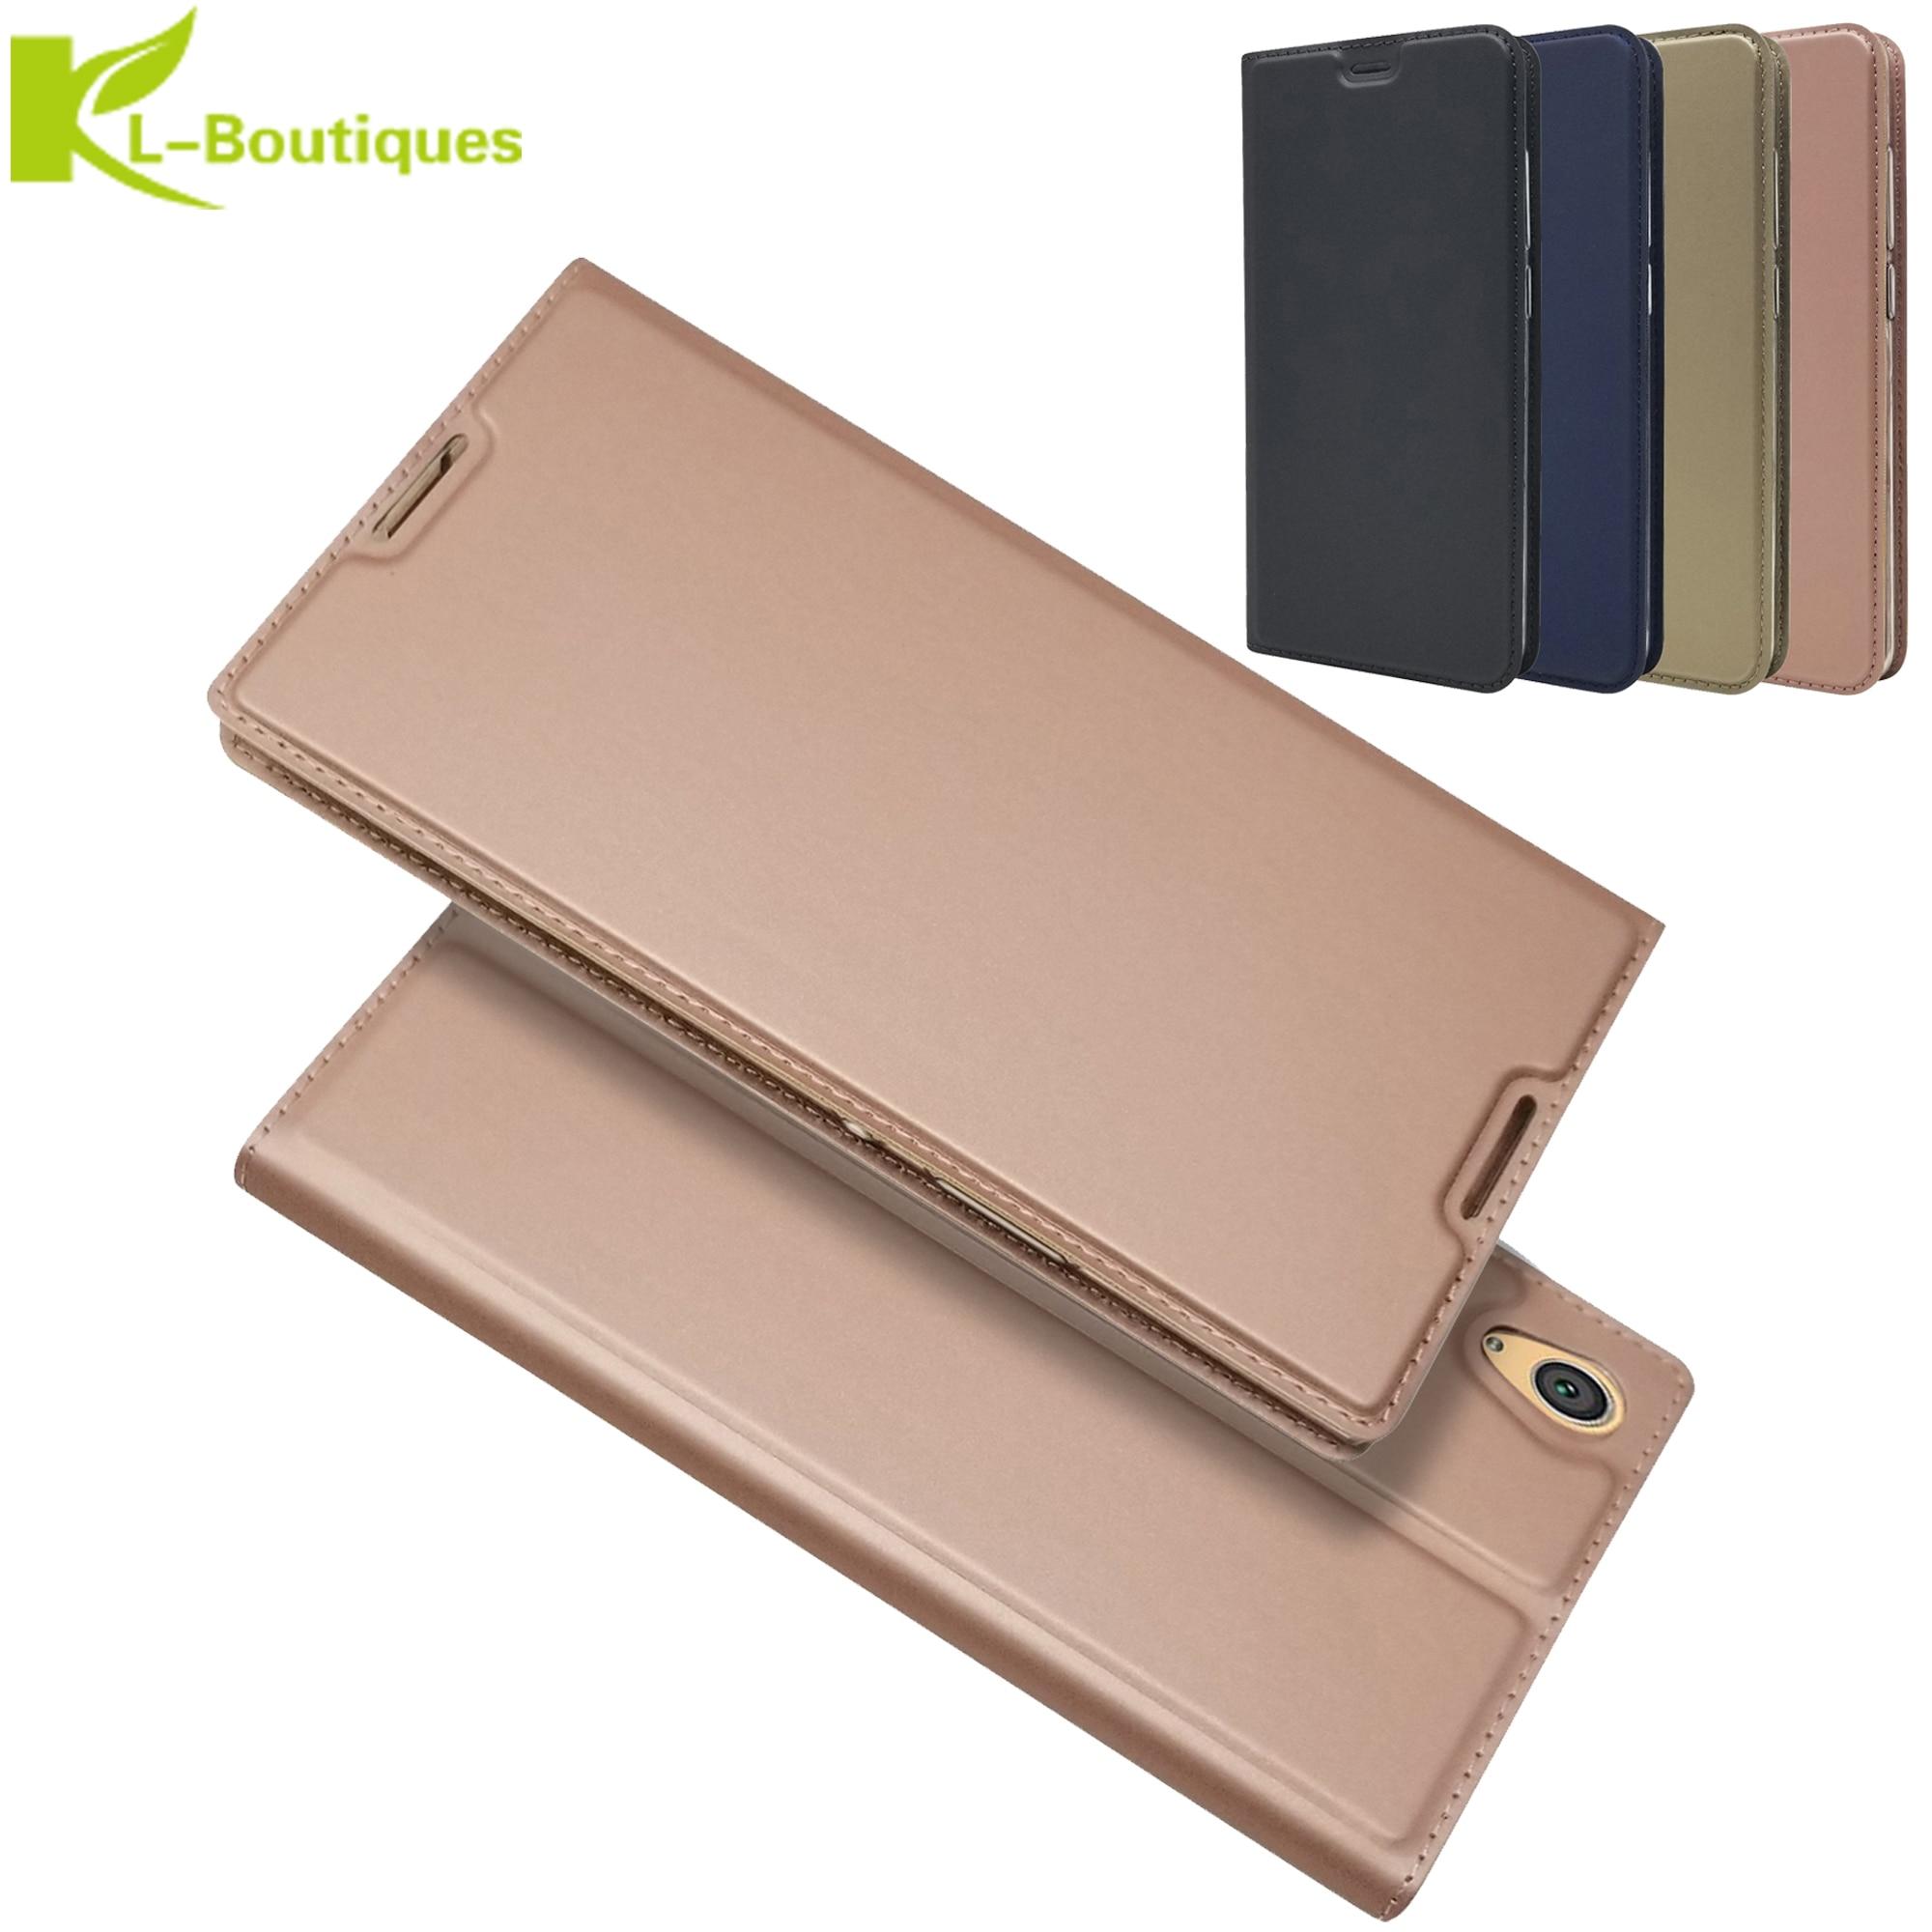 PU Leather Case Fundas For Sony Xperia XA1 Ultra G3226 Cover Magnetic Flip Capa For Sony XA1 XA 1 Ultra G3221 G3223 G3212 Cases